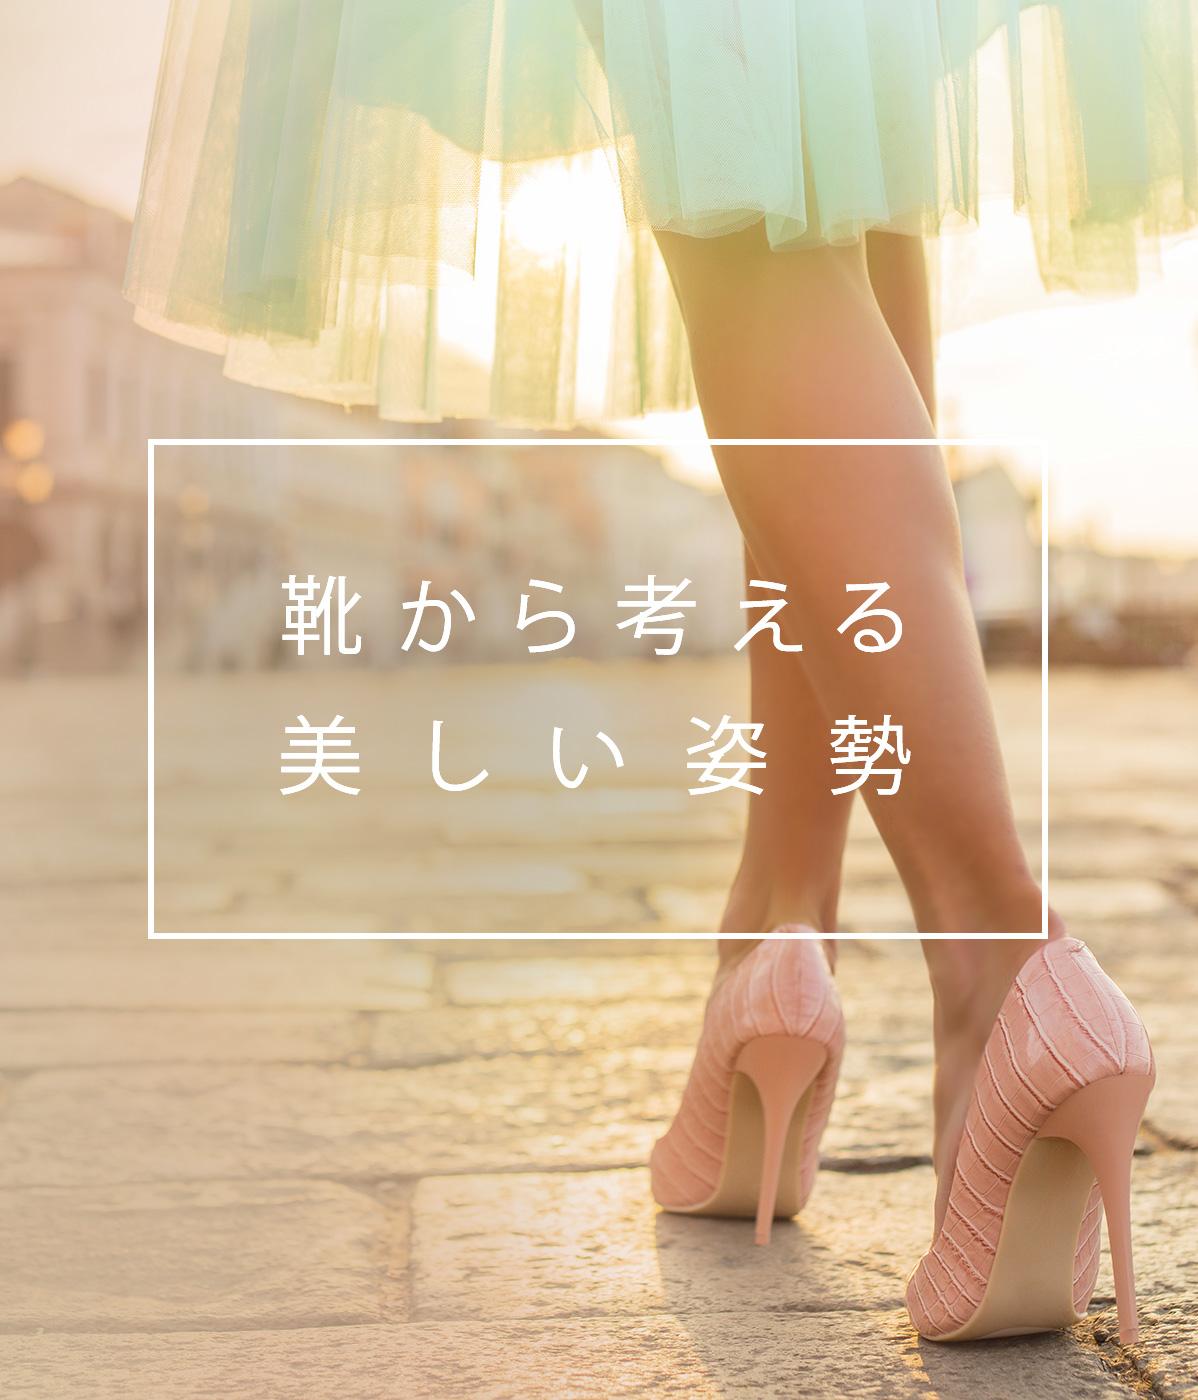 zapaterie|靴から考える美しい姿勢